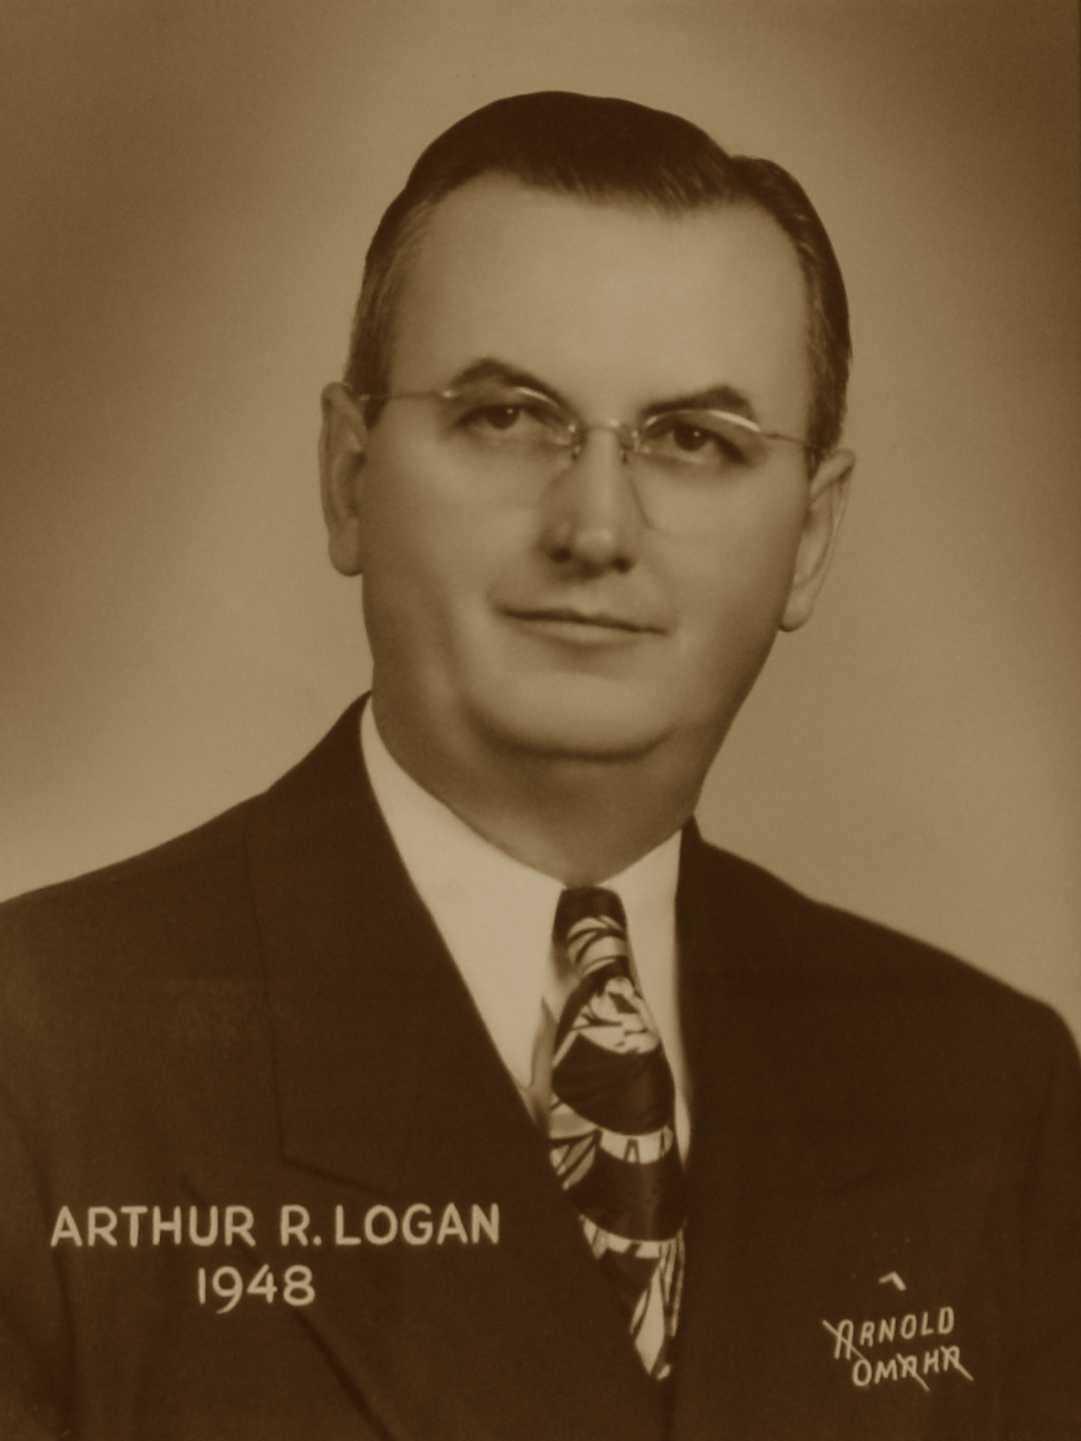 Arthur R. Logan, 1948